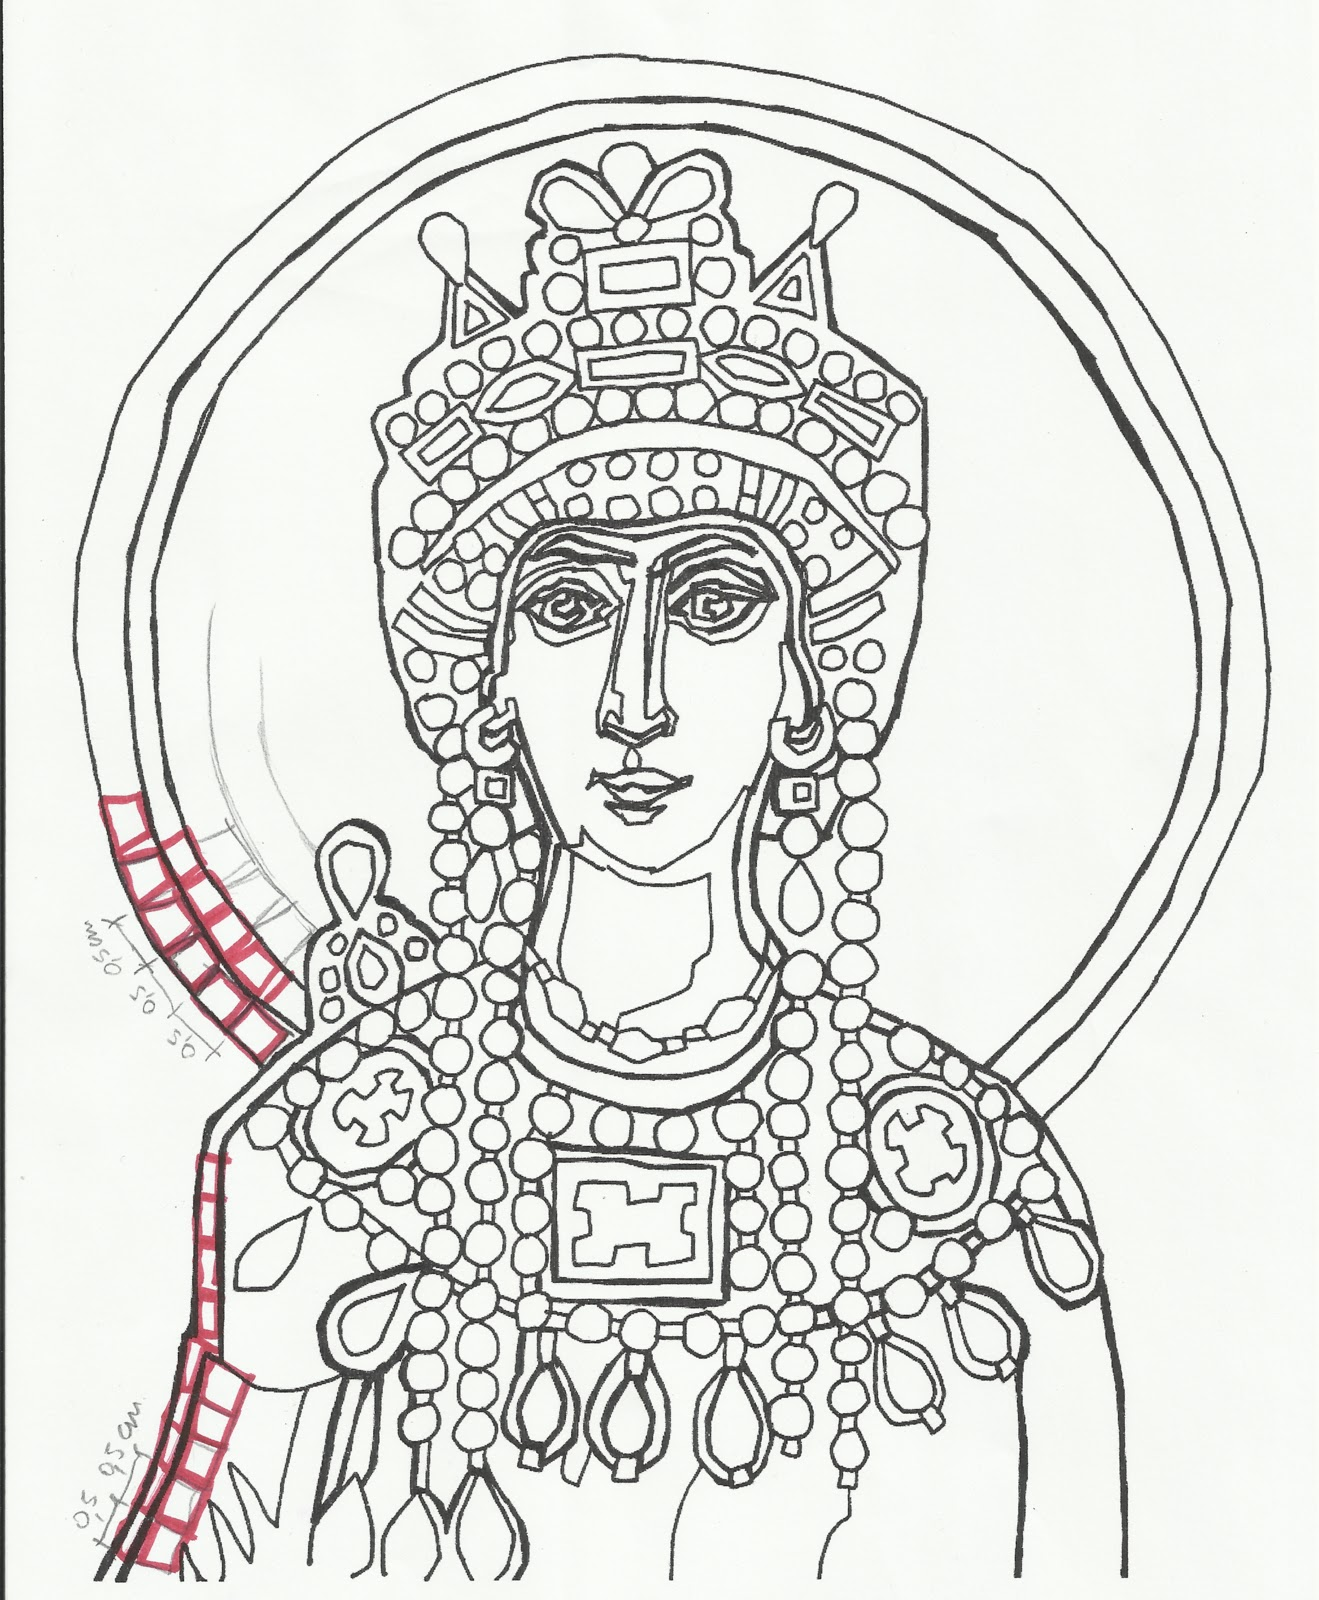 Immagini di mosaici da colorare hj45 regardsdefemmes for Disegni per mosaici da stampare